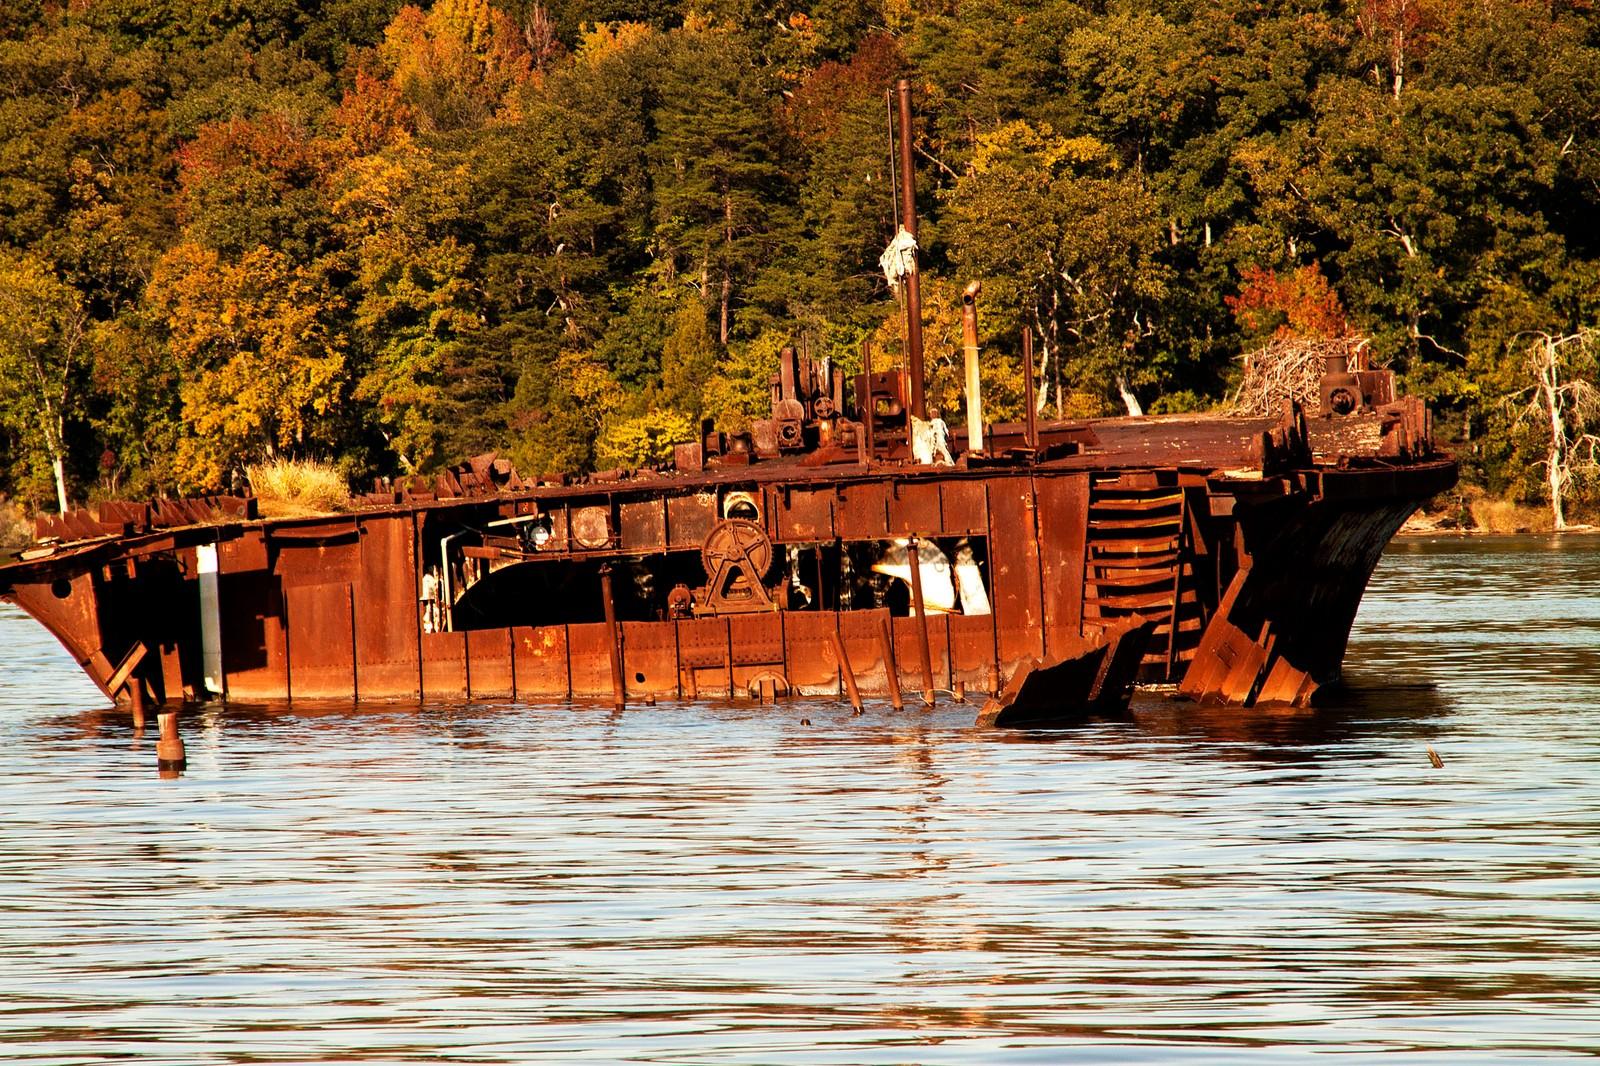 Skipsvrak på Potomac-elven i Maryland.